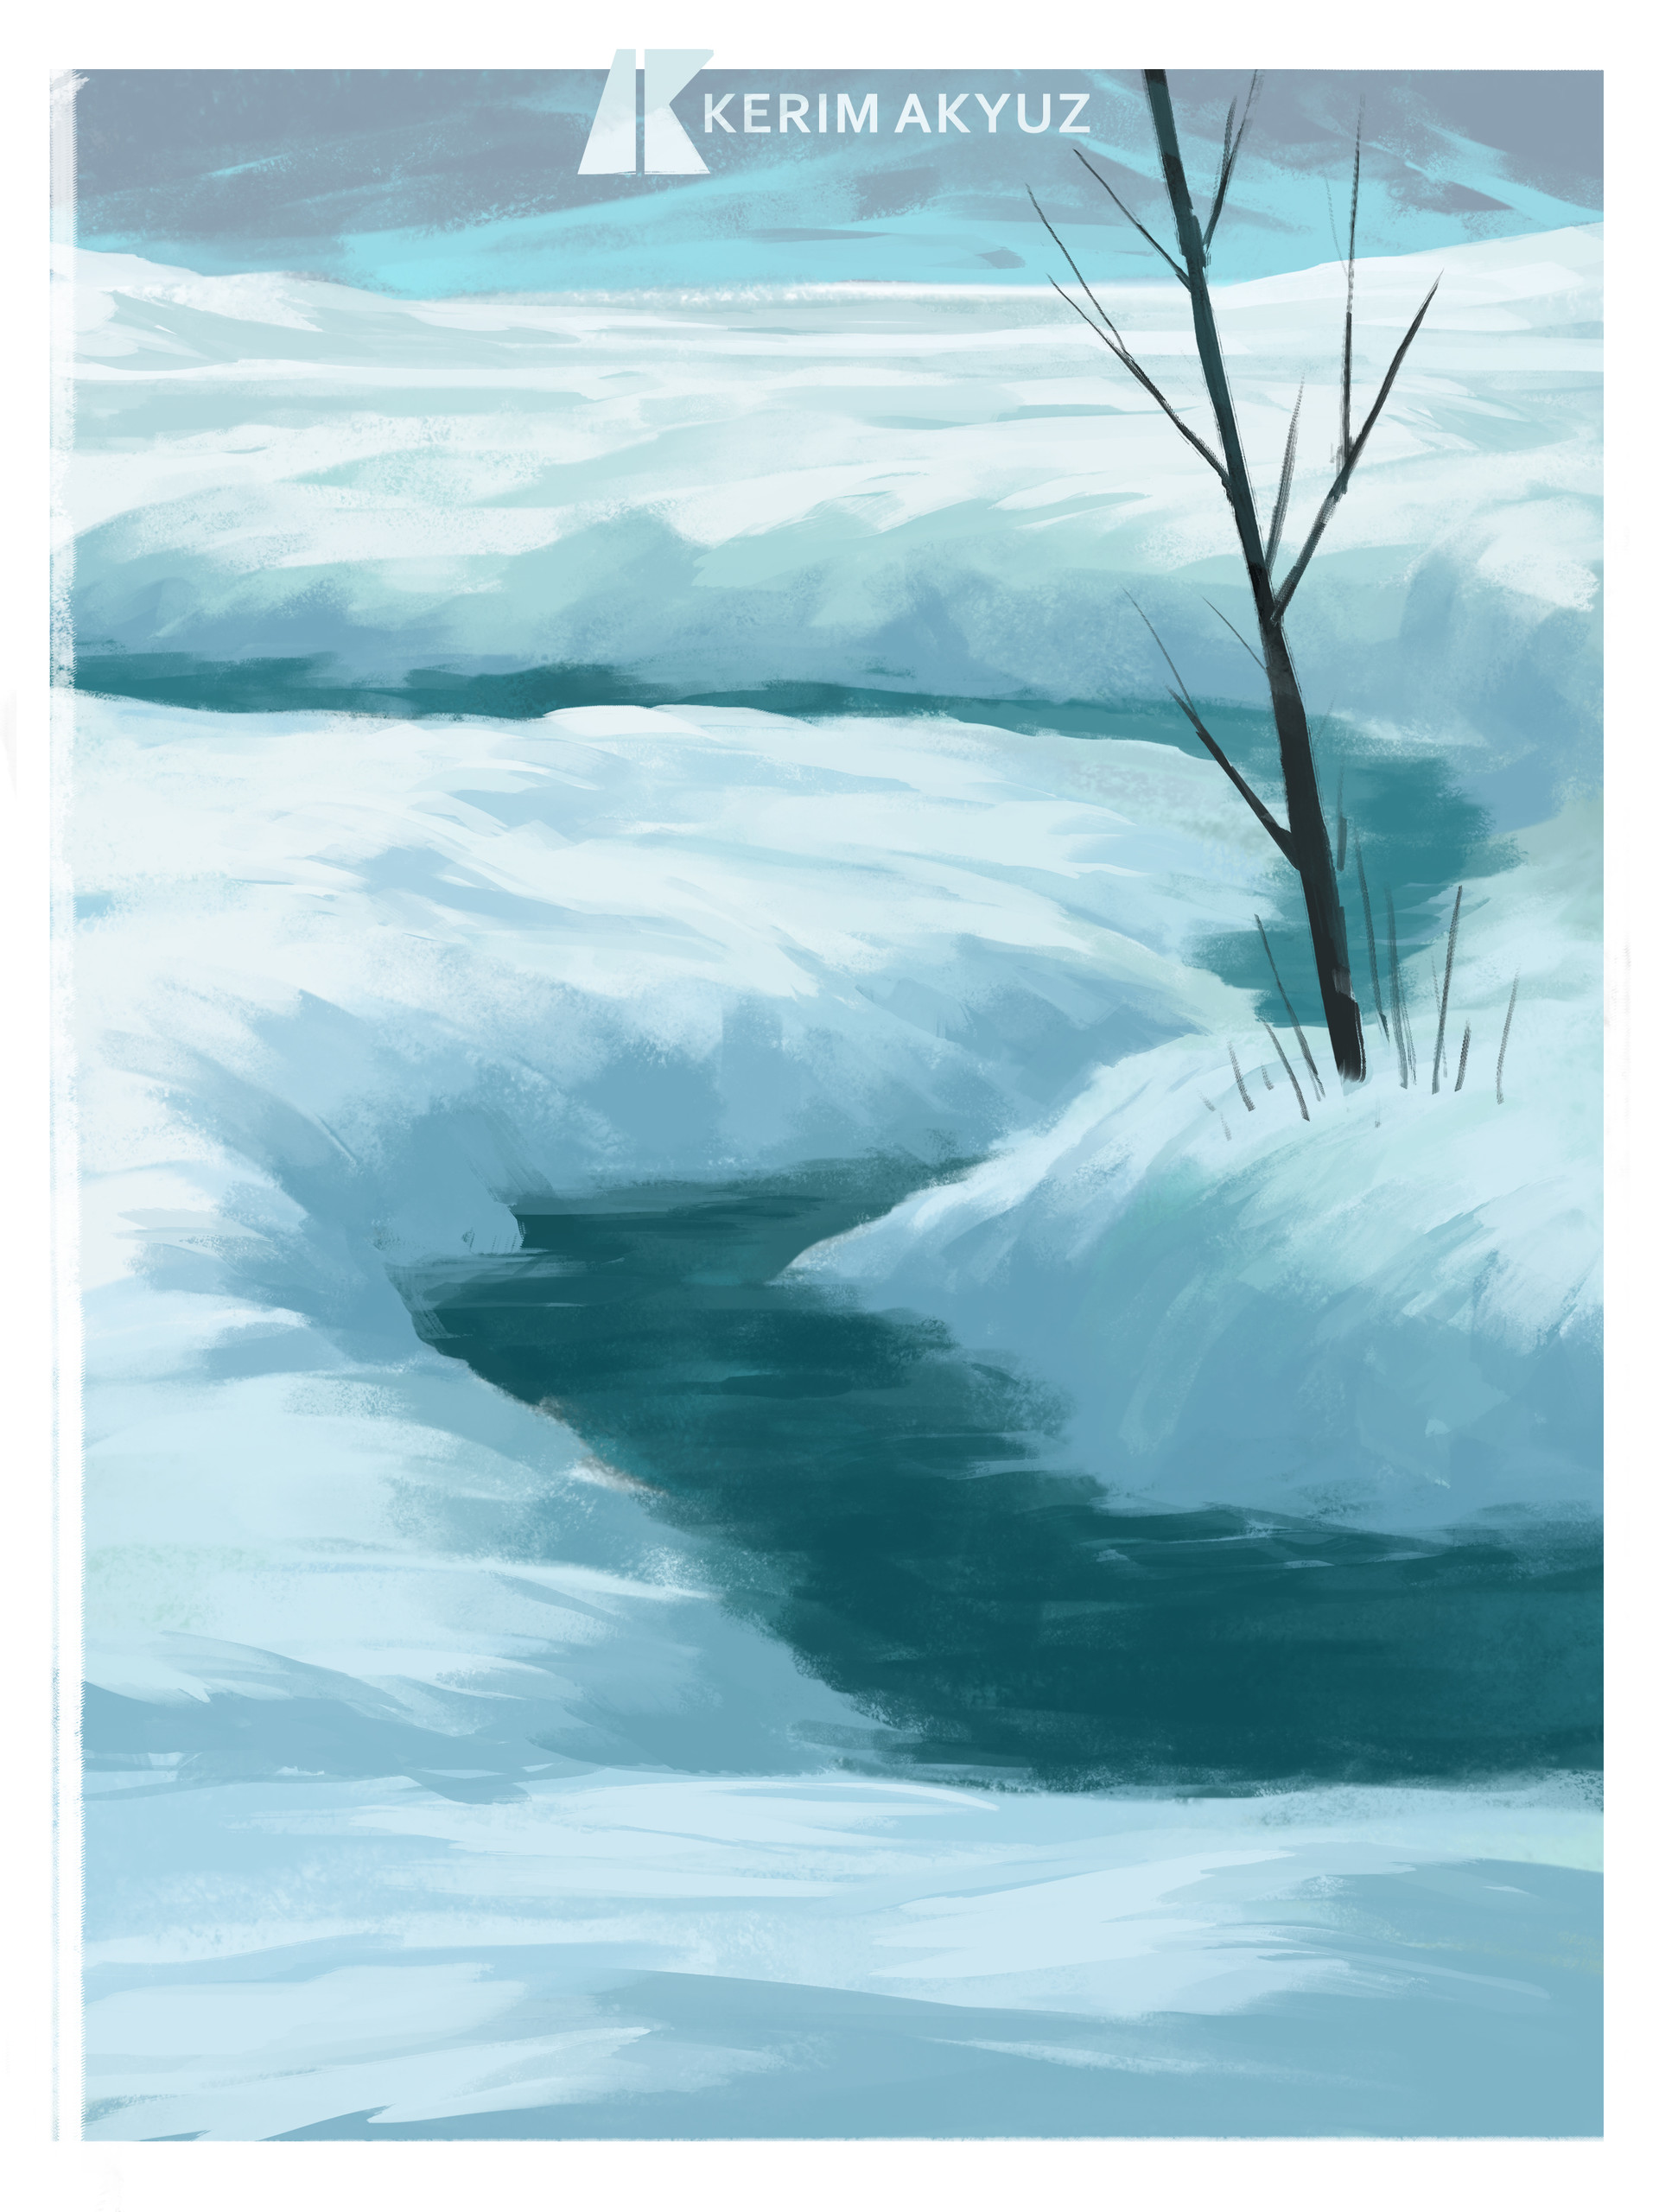 Kerim akyuz 112 snow2